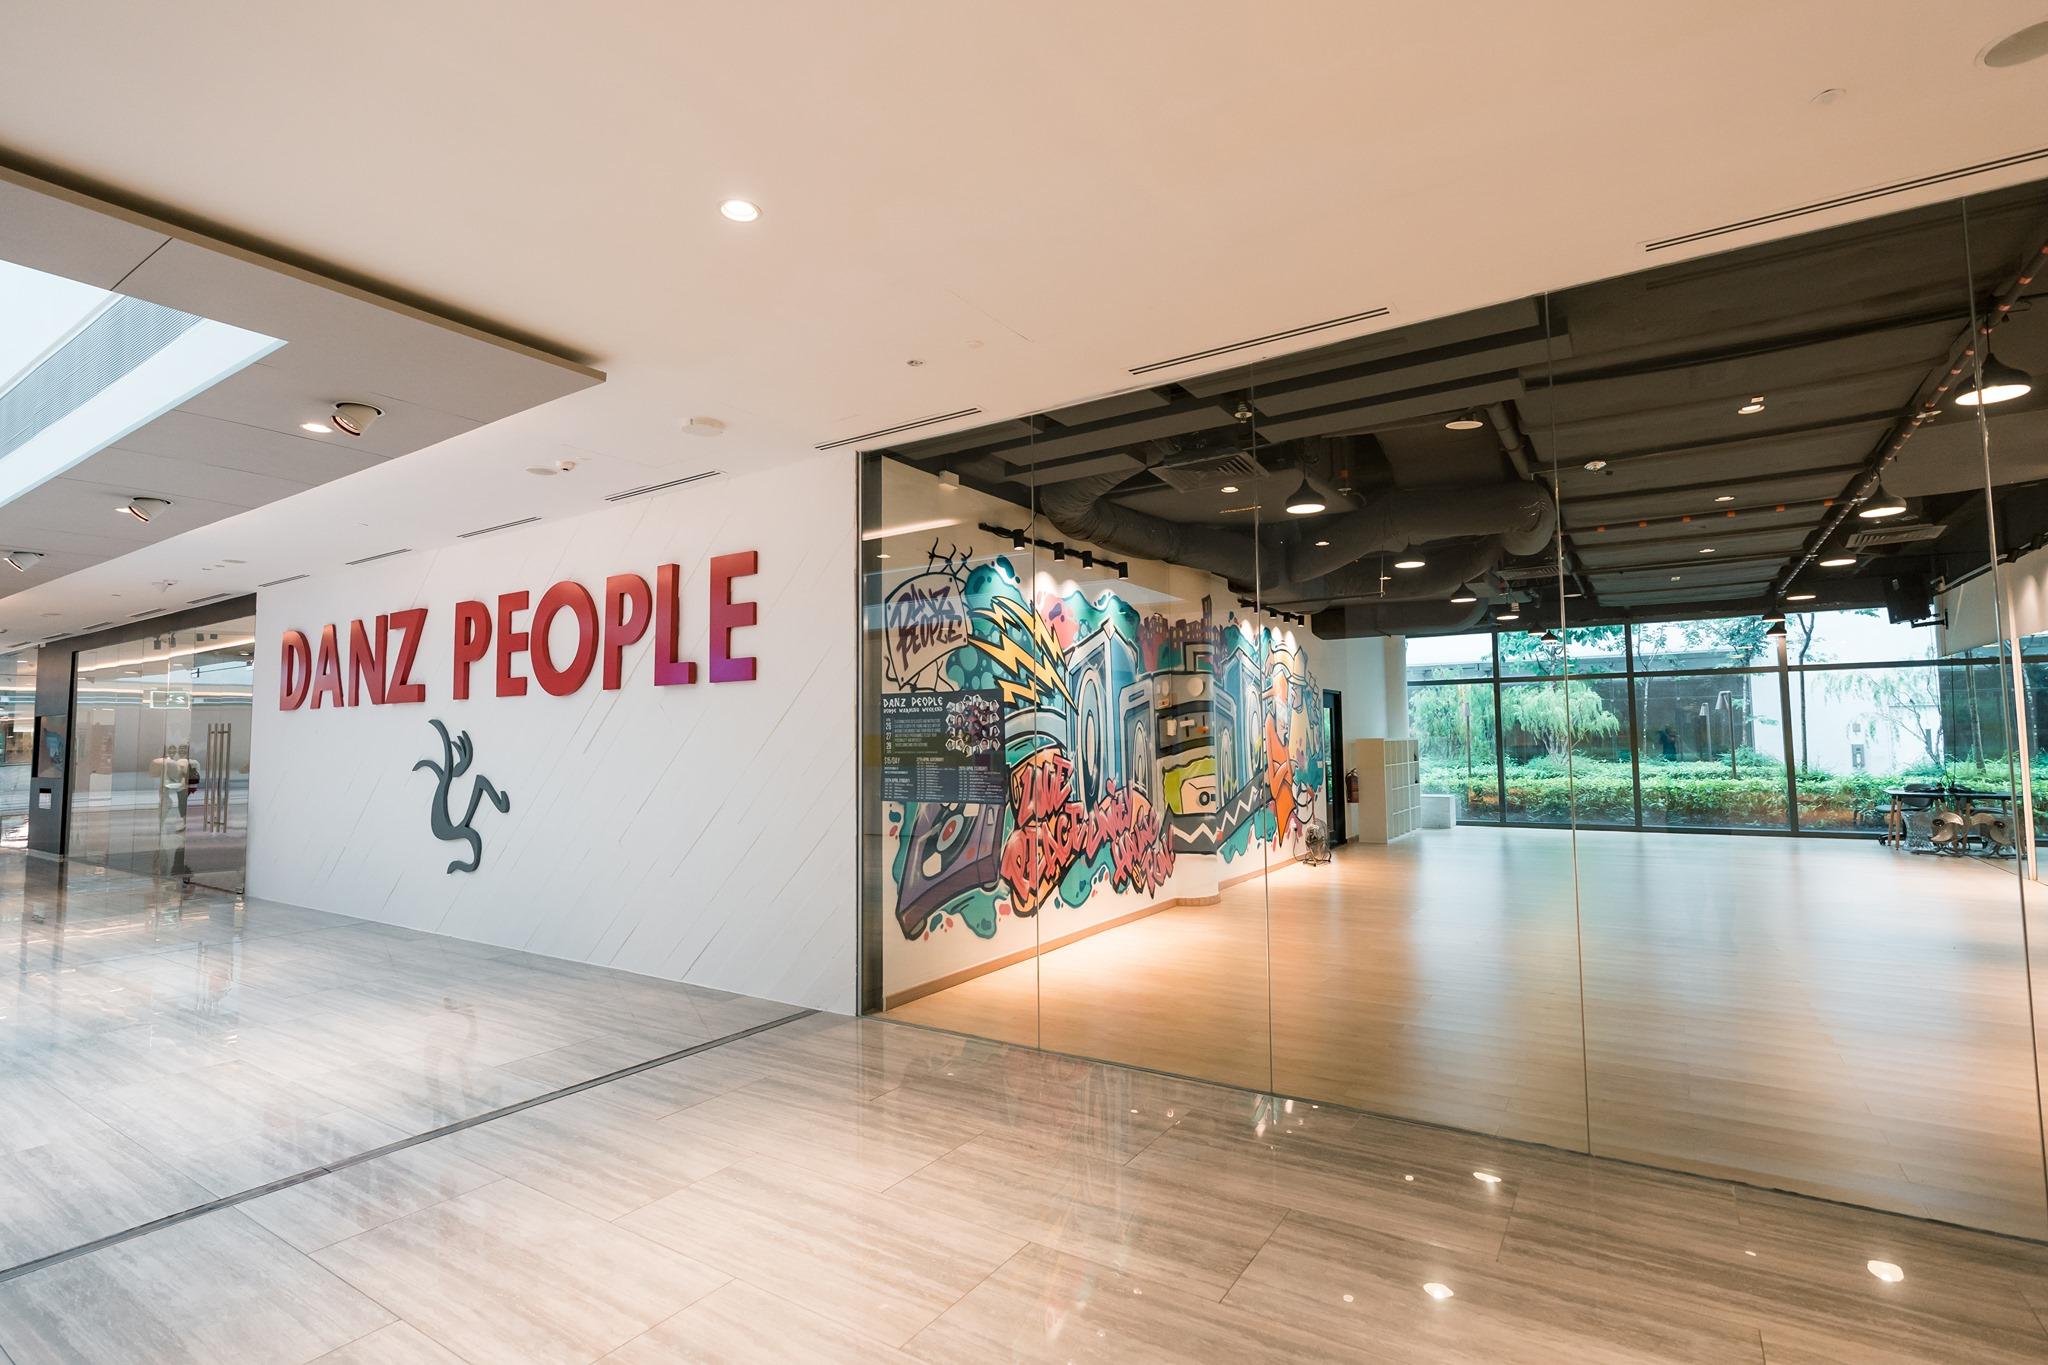 danz people dance studio in singapore